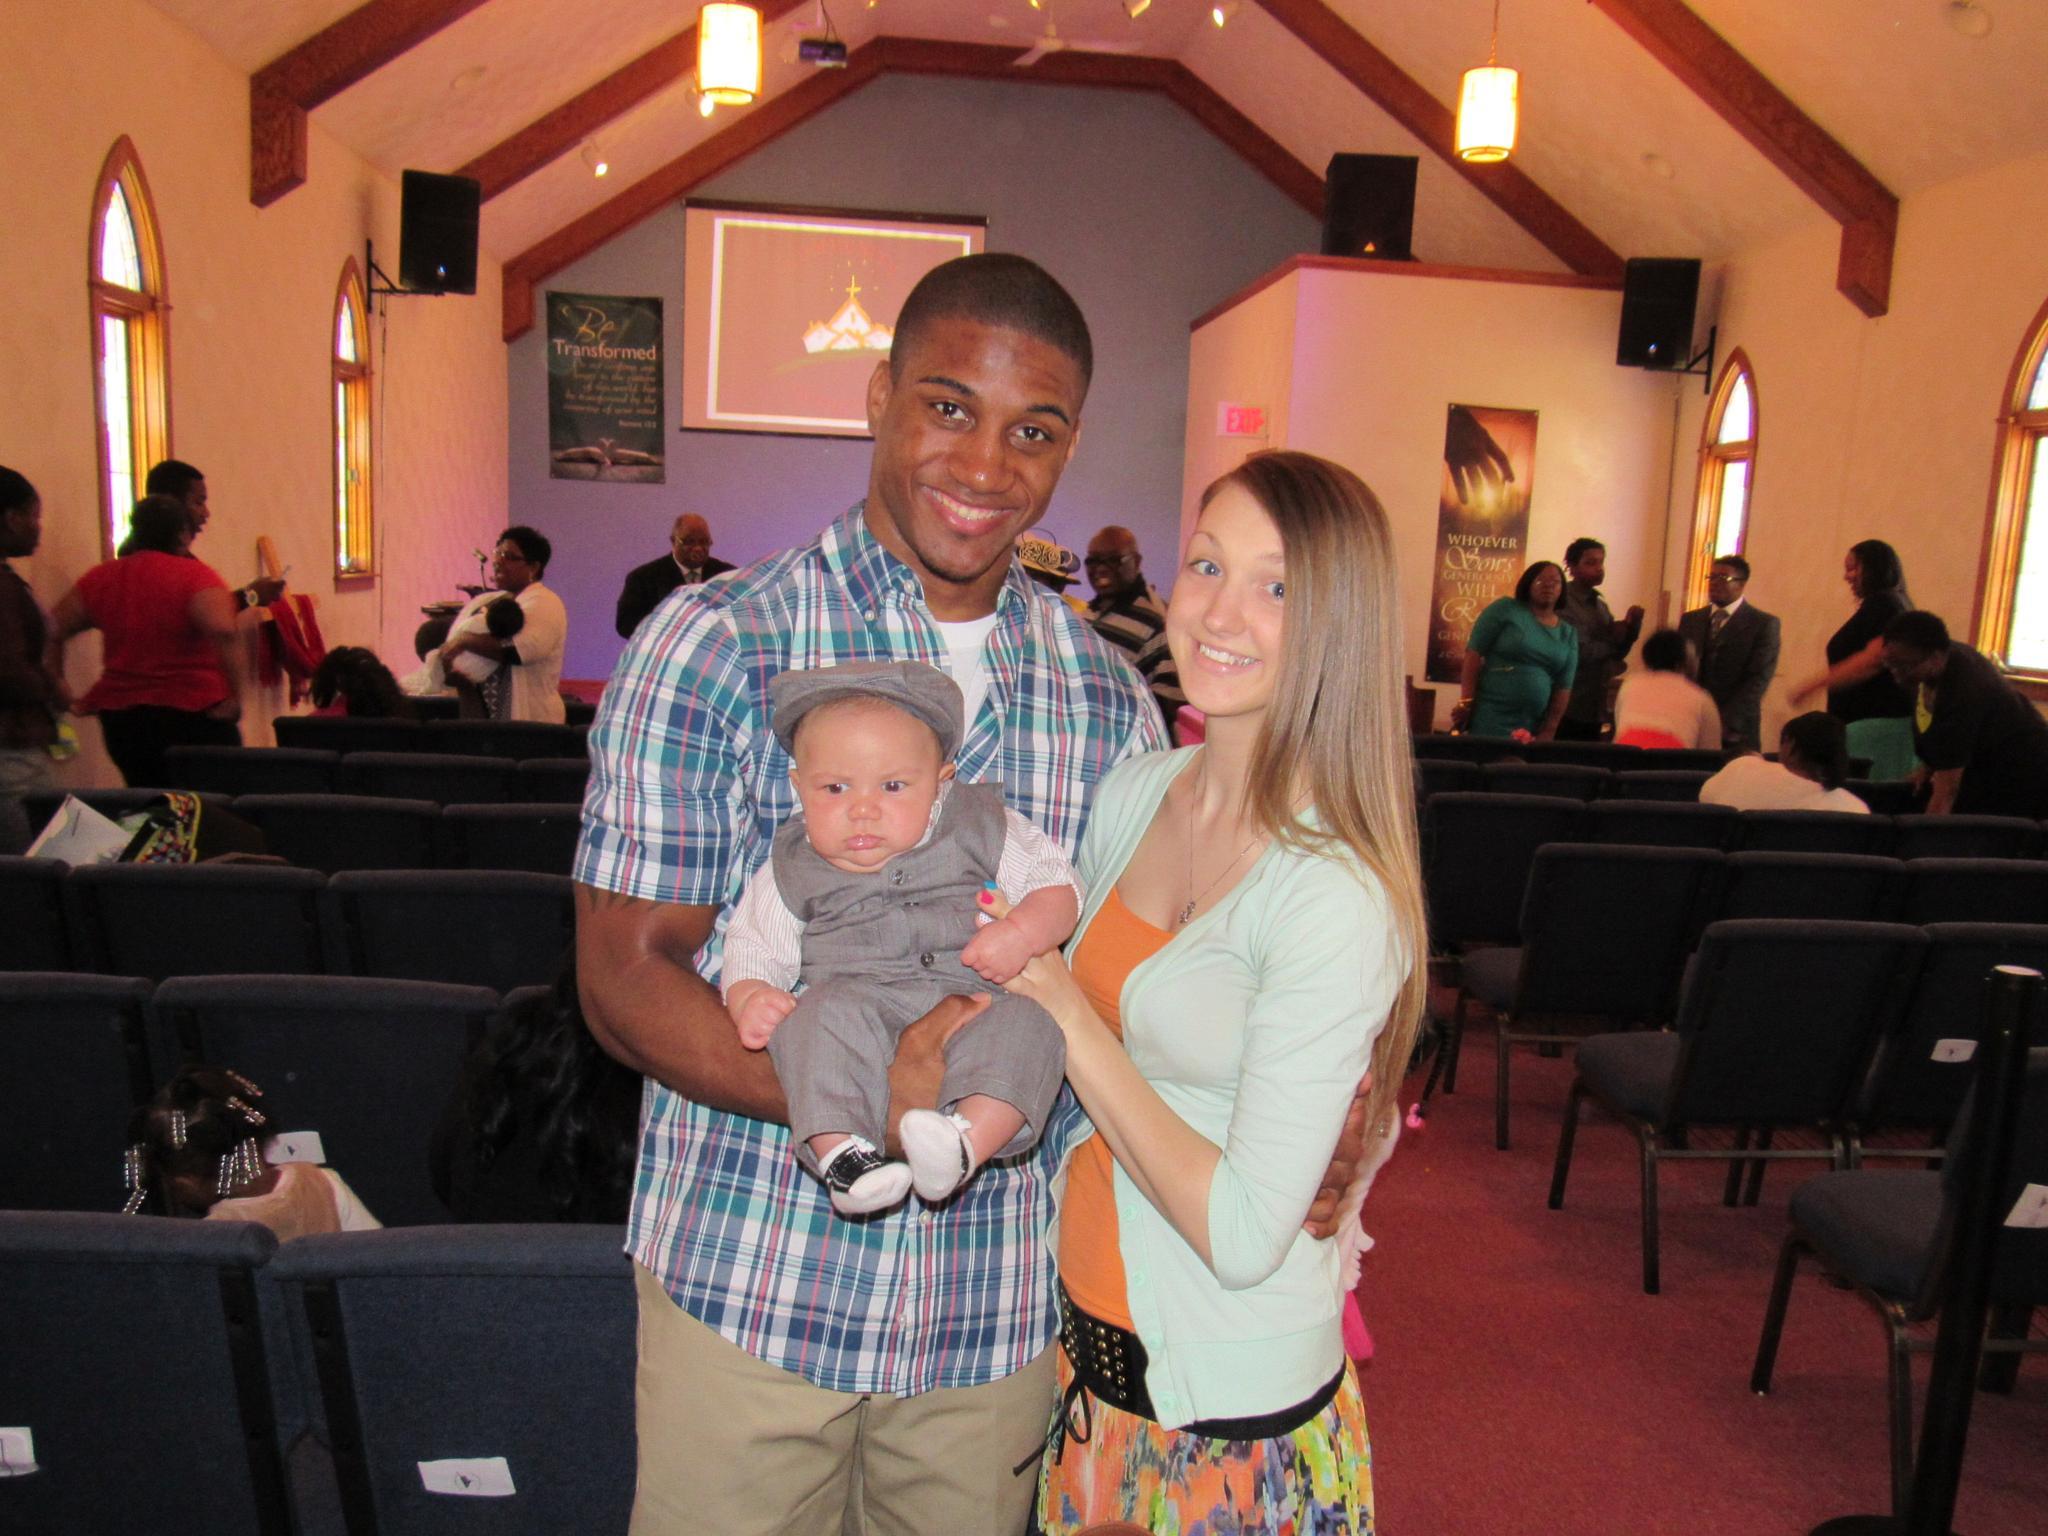 Sunday service by Lamar Smith